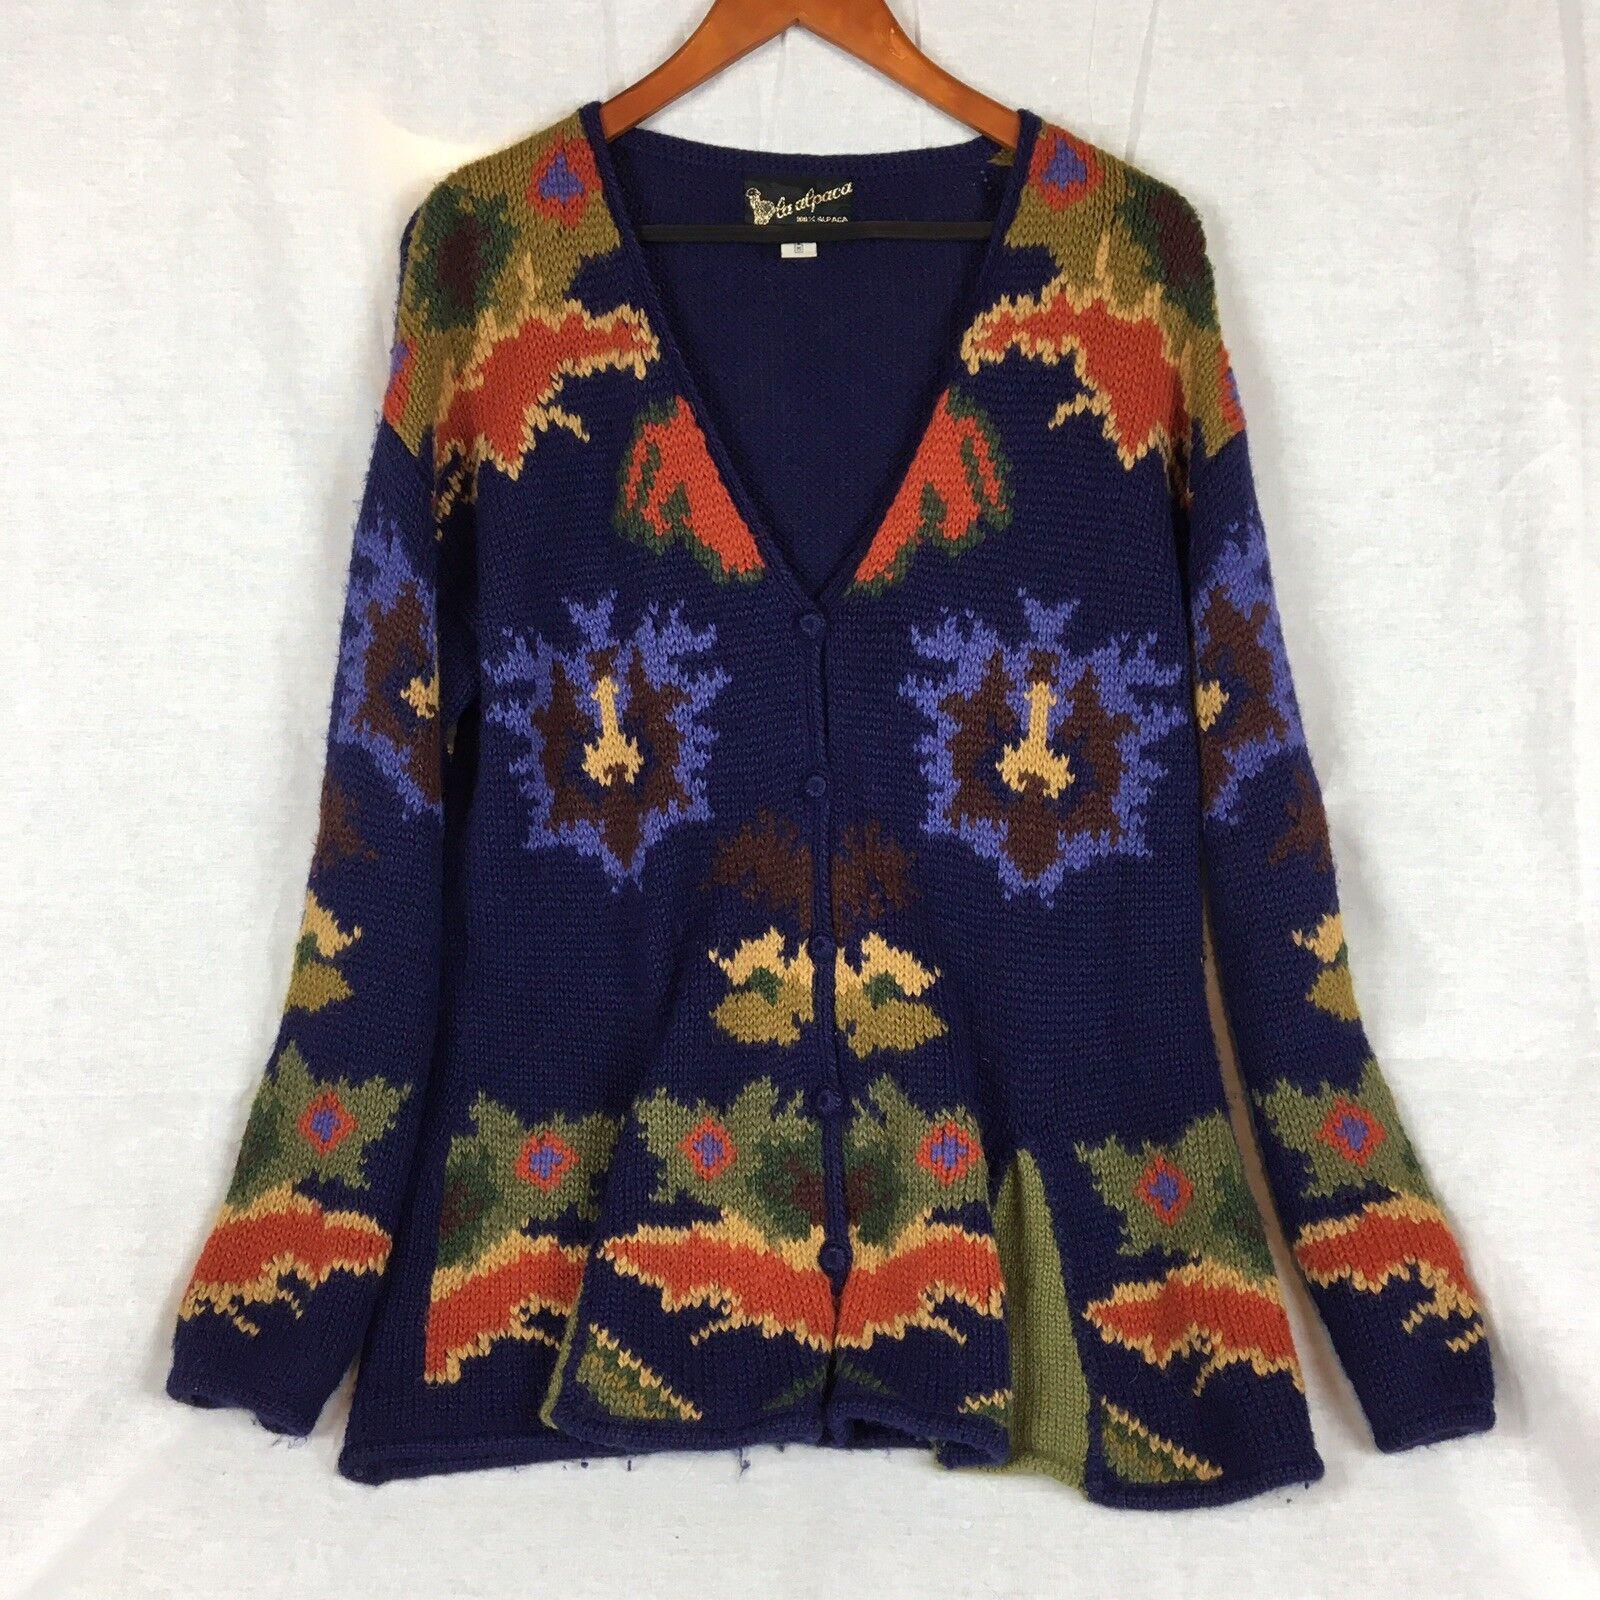 Beautiful La Alpaca Alpaca Alpaca 100% ALPACA Cardigan Sweater Size Medium Hand Loomed In Peru ec98b6